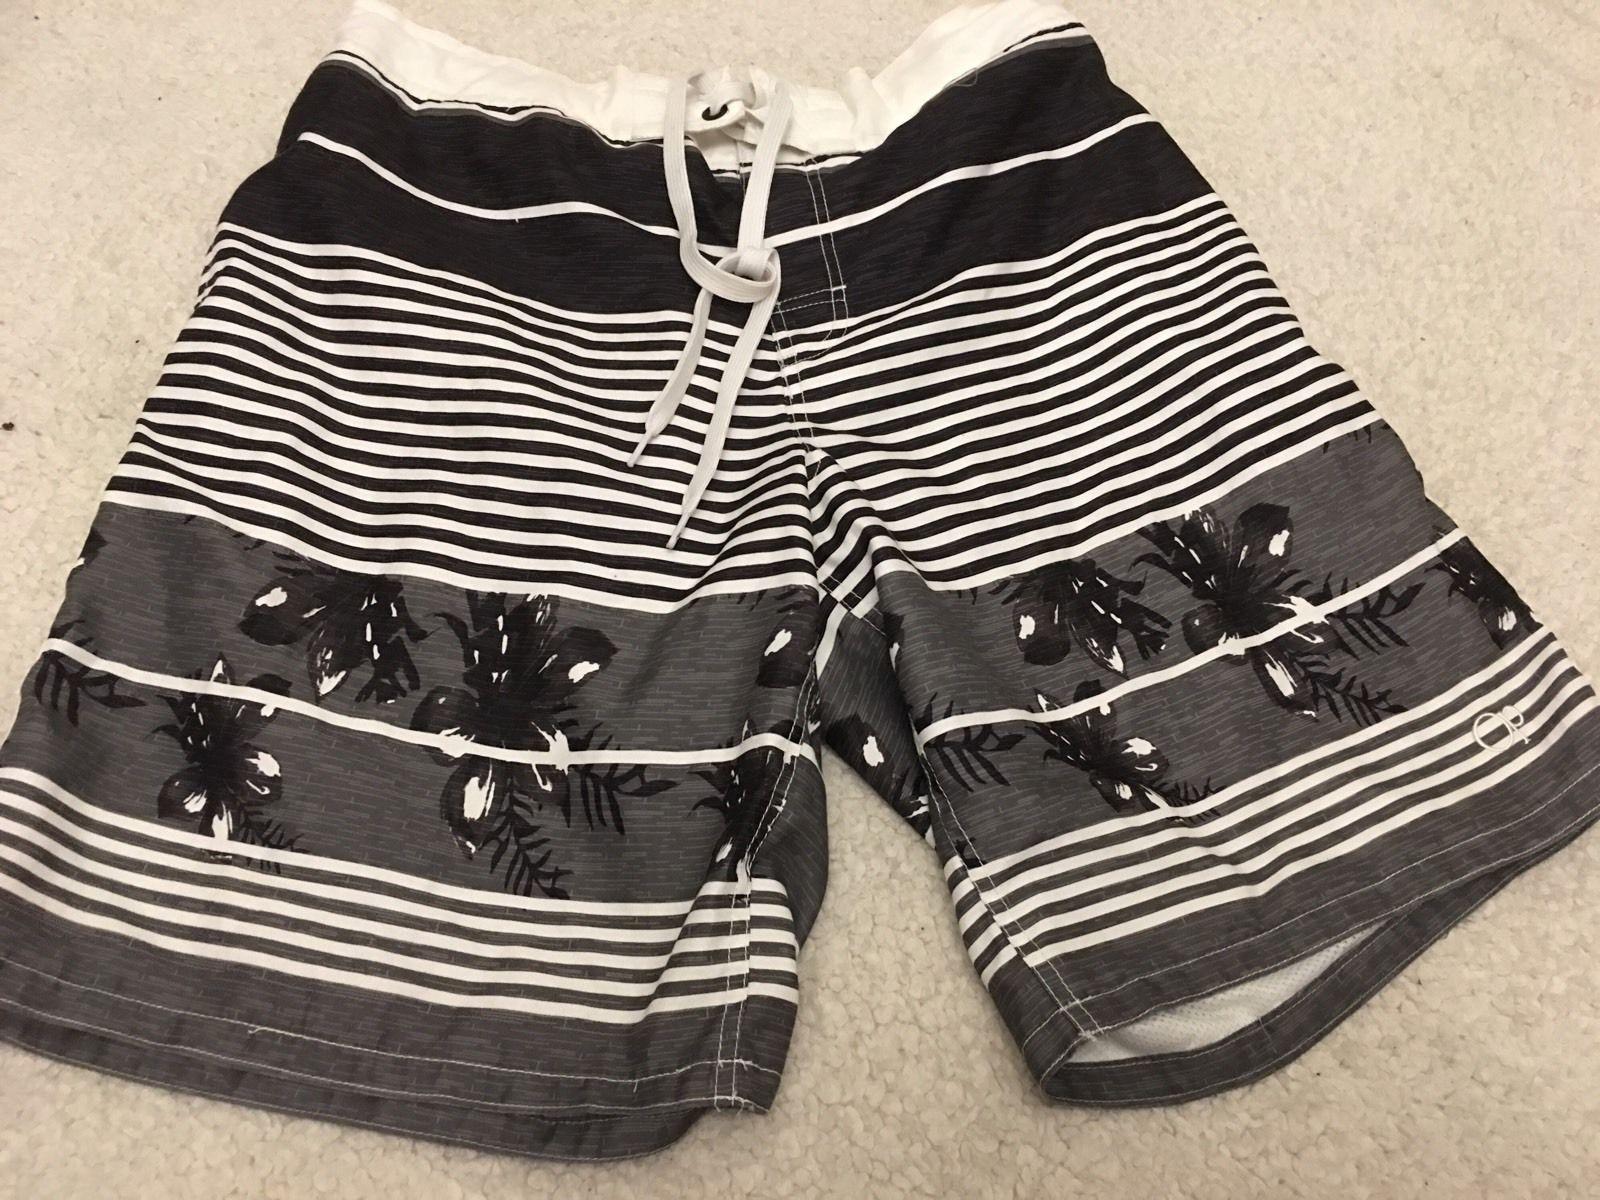 46f2772d03 Men's OP Swim Trunks Striped and 50 similar items